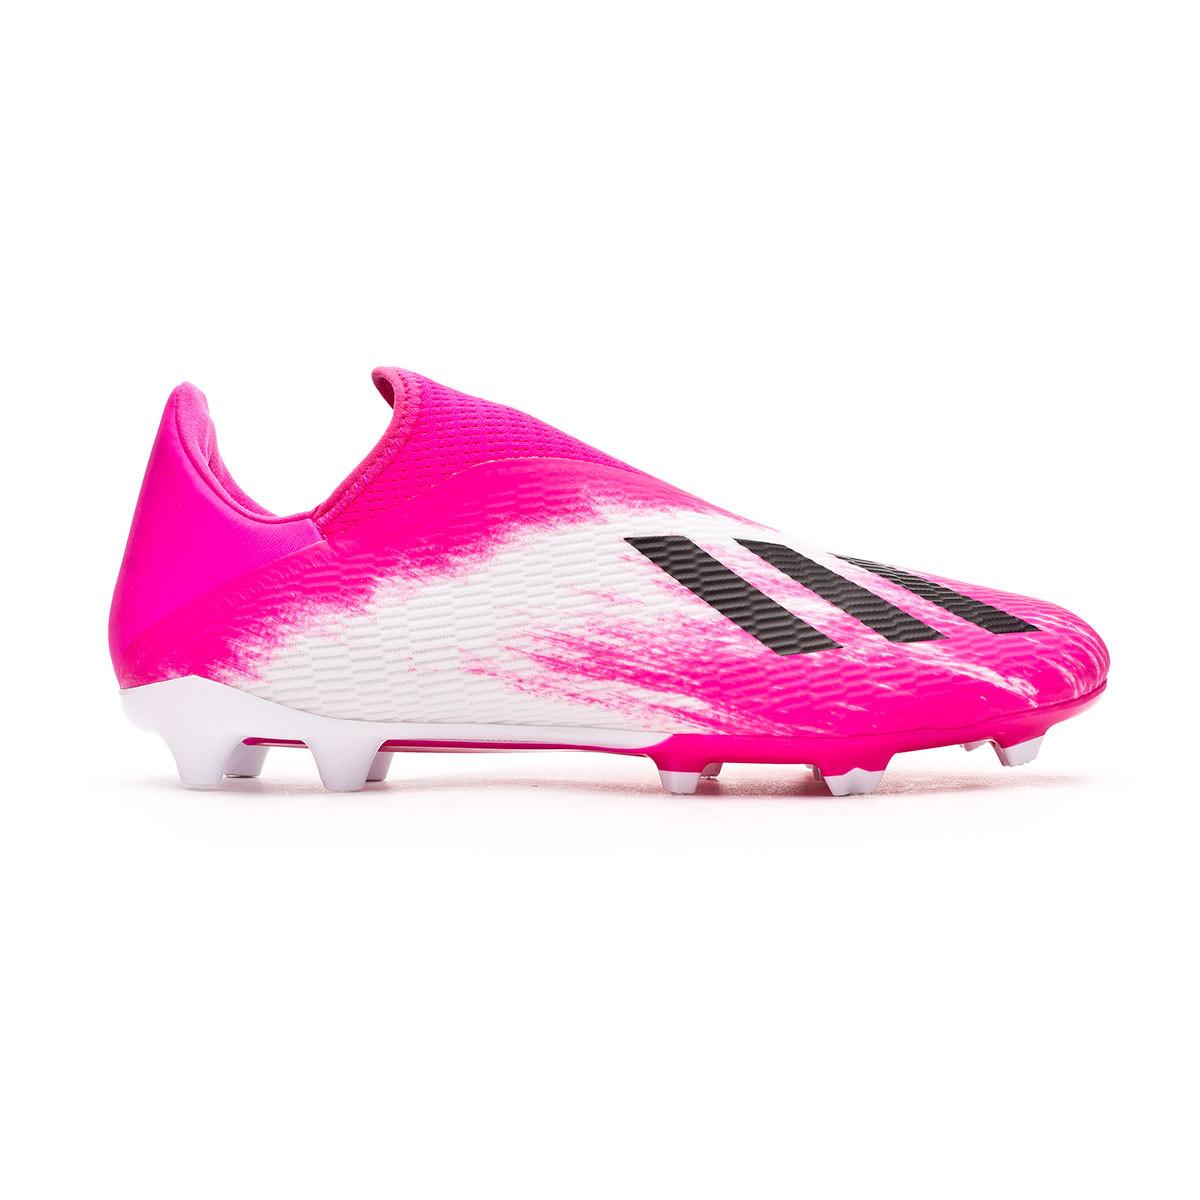 al menos lobo Abiertamente  Football Boots adidas X 19.3 LL FG White-Black-Shock pink - Football store  Fútbol Emotion